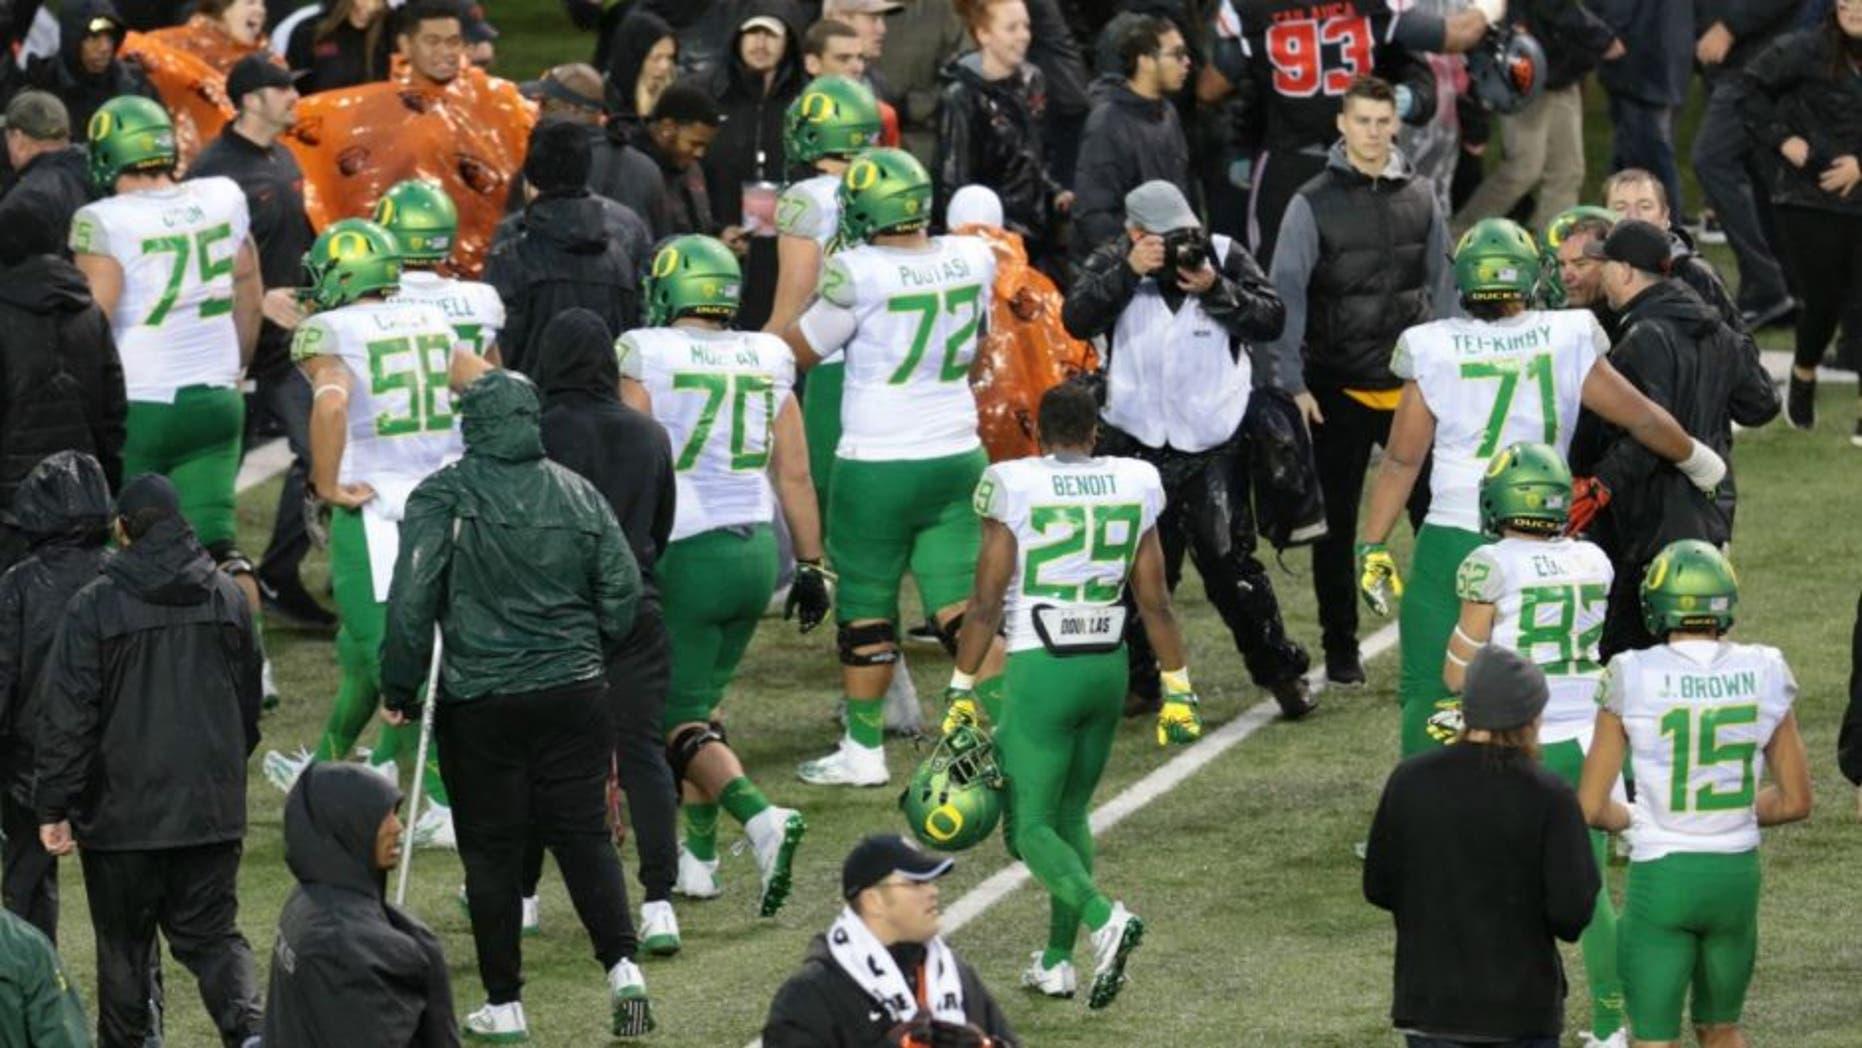 Nov 26, 2016; Corvallis, OR, USA; Oregon Ducks players walk off the field following a lose (24-34) Oregon State Beavers at Reser Stadium. Mandatory Credit: Scott Olmos-USA TODAY Sports